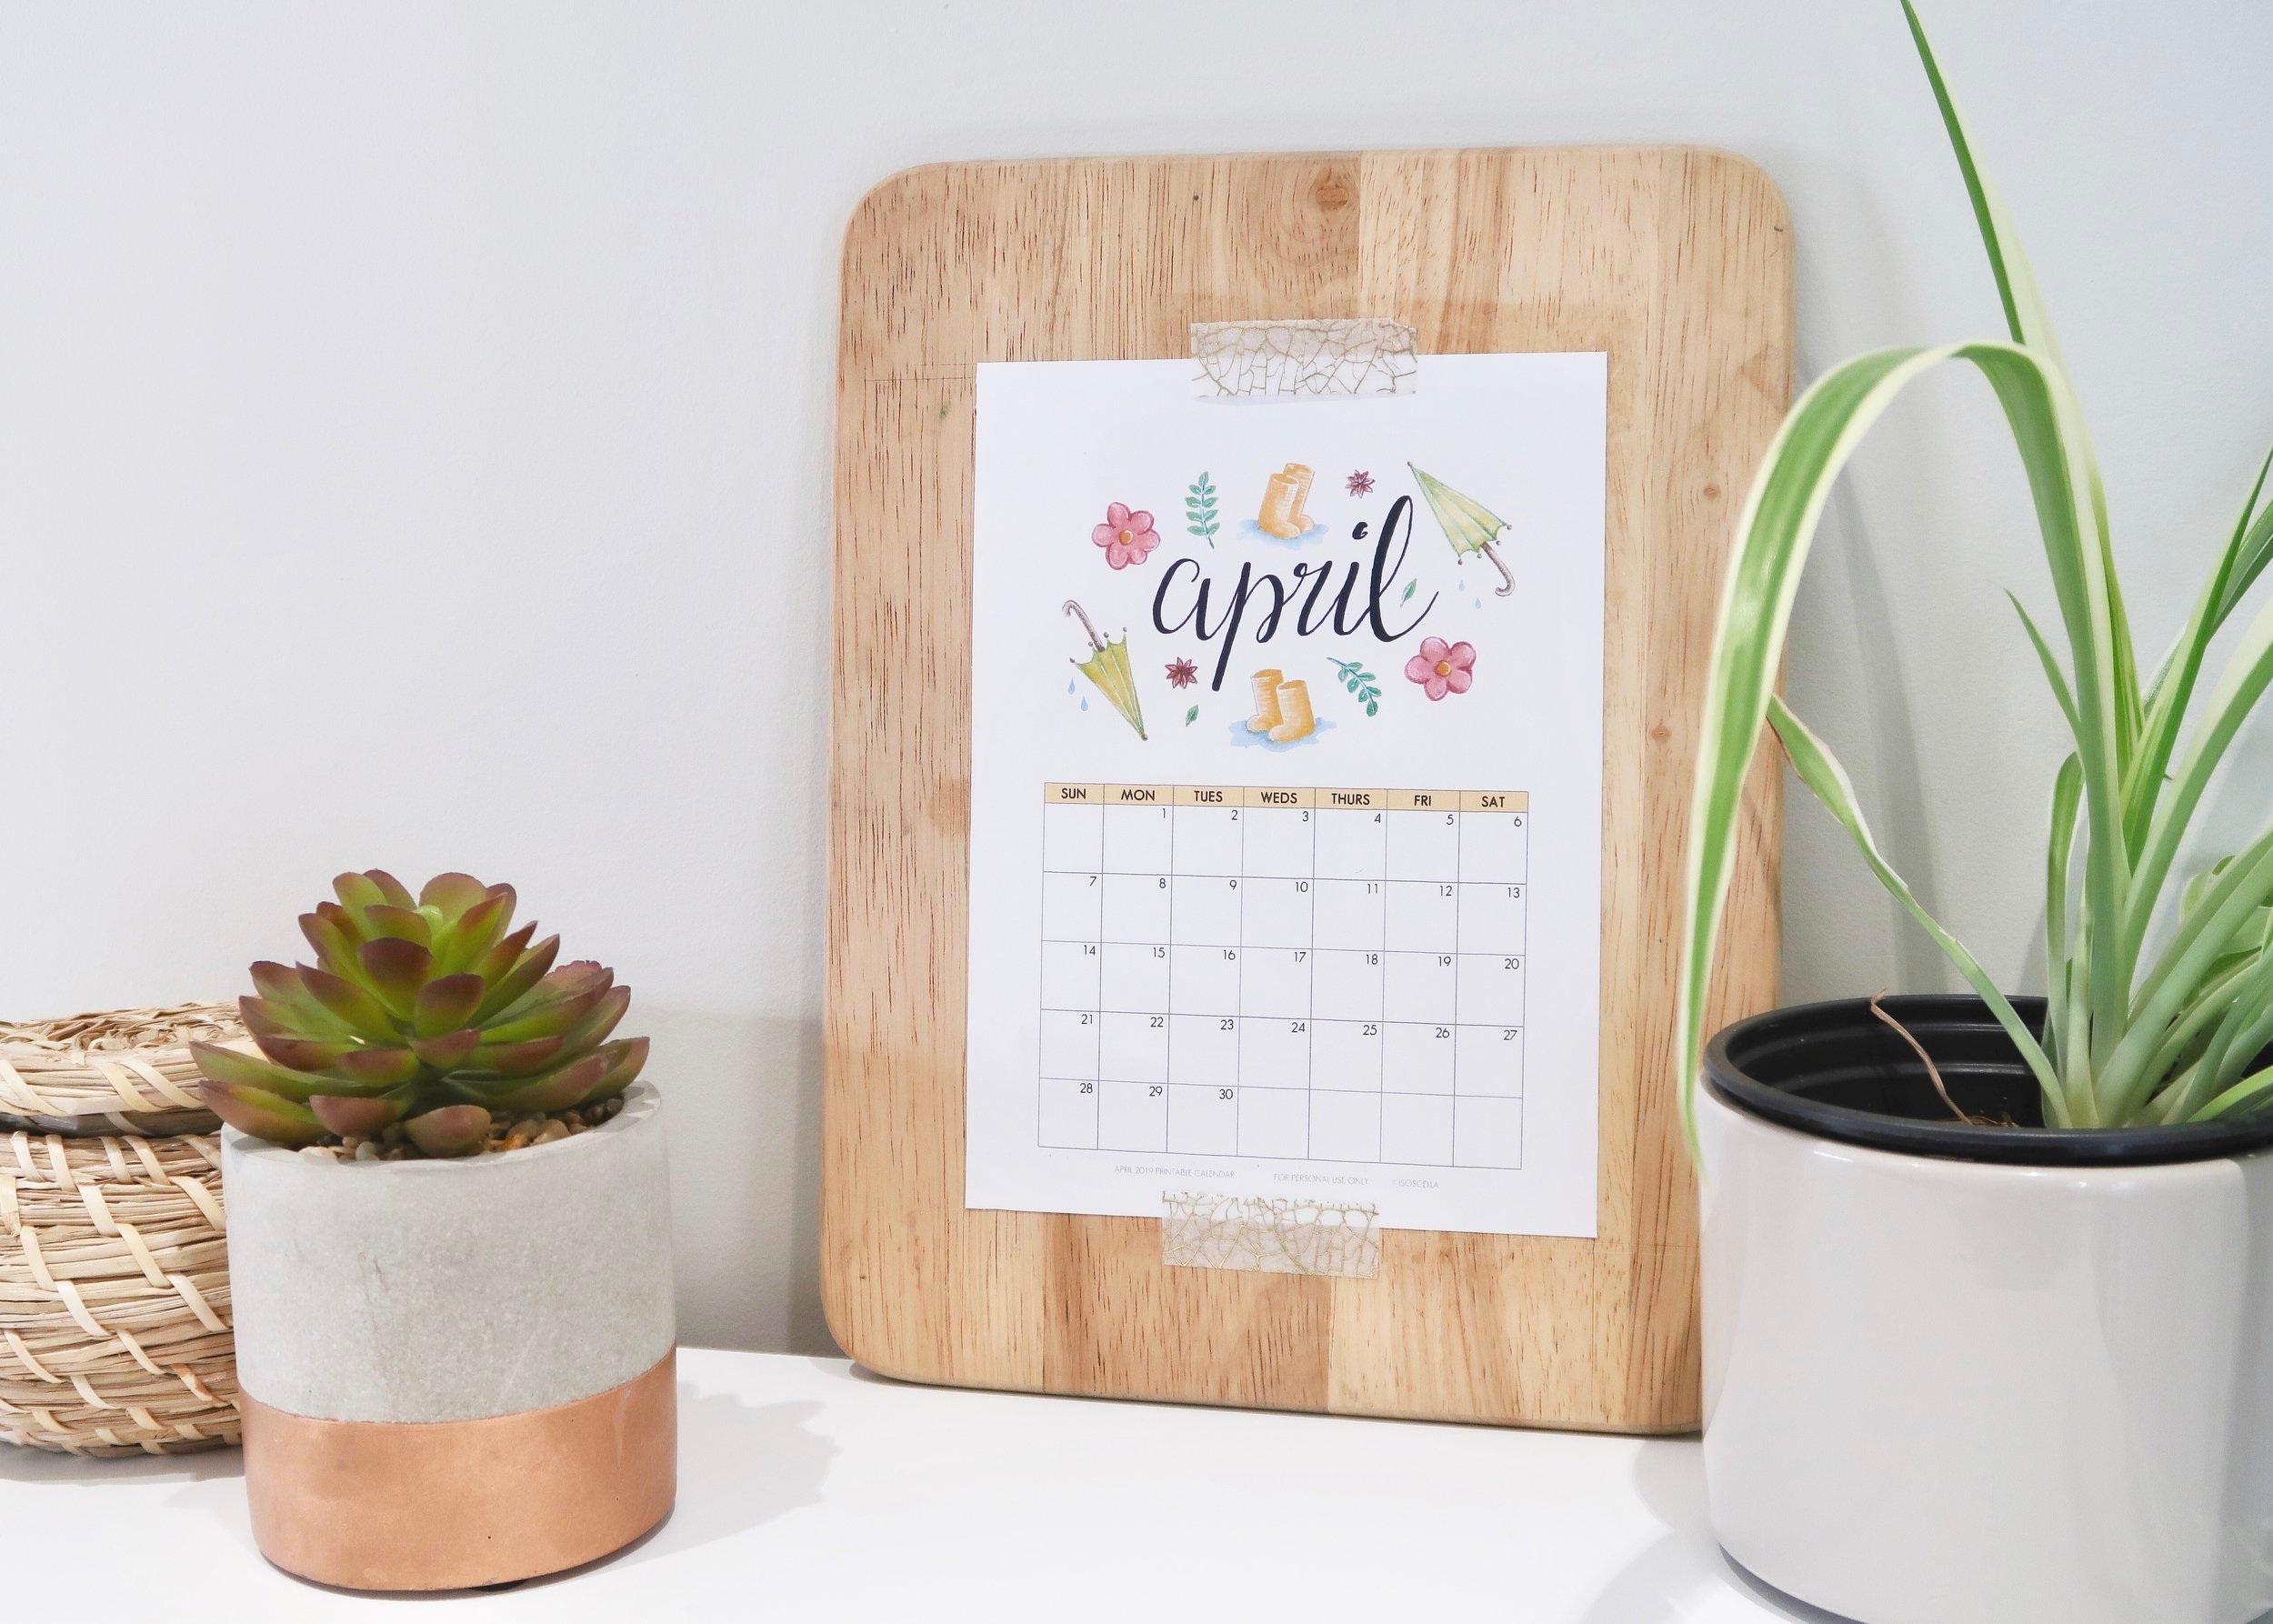 Illustrated April 2019 Calendar by Isoscella